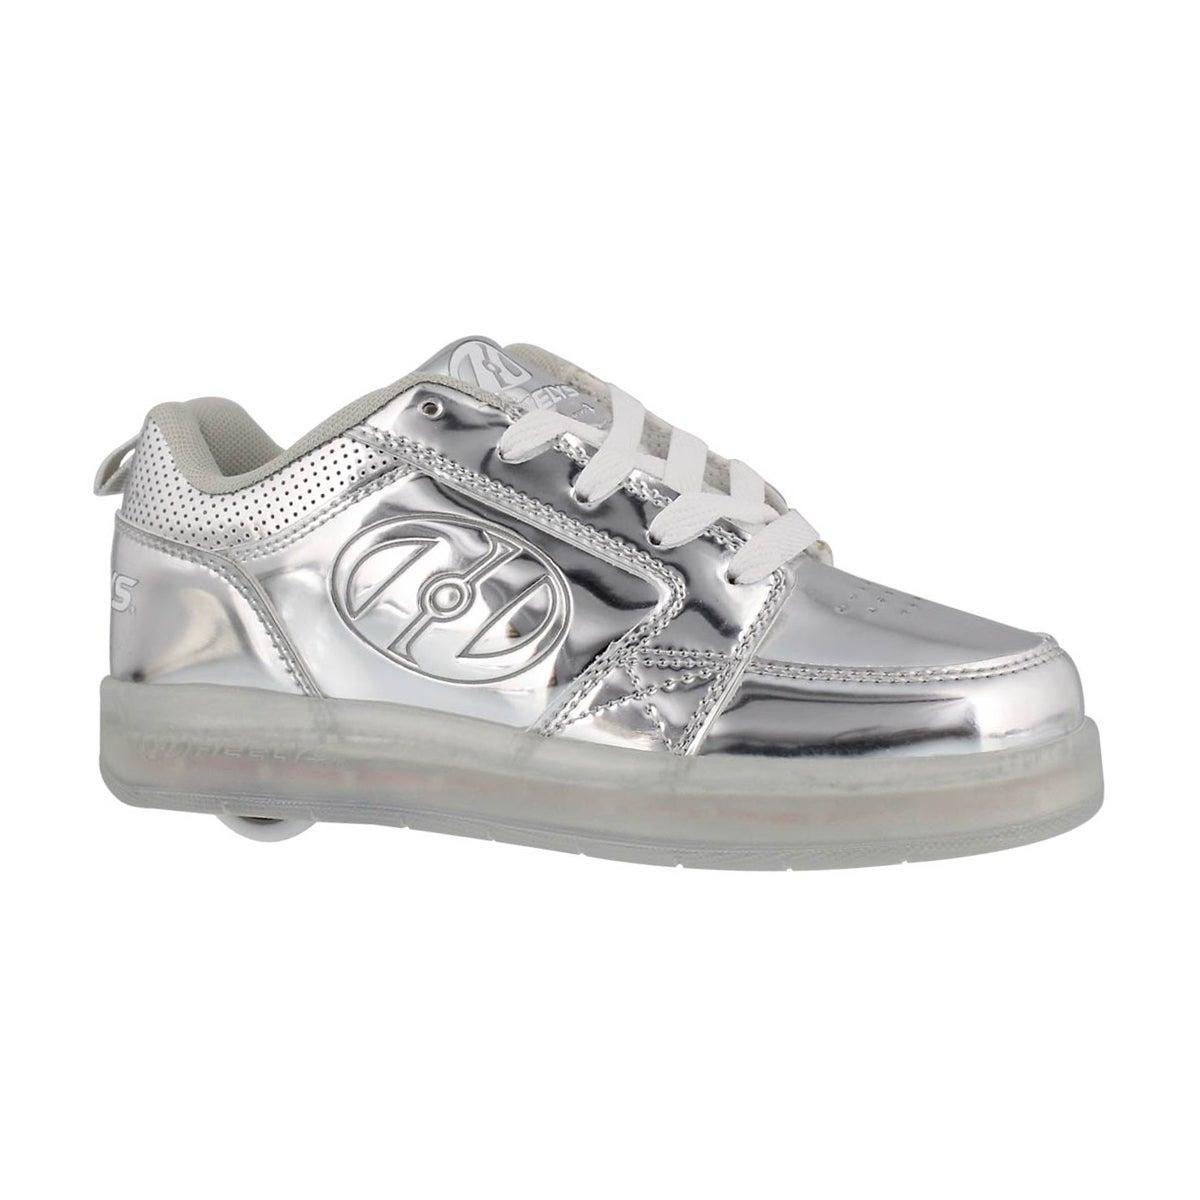 Kids' PREMIUM 1 LO silver light up skate sneakers